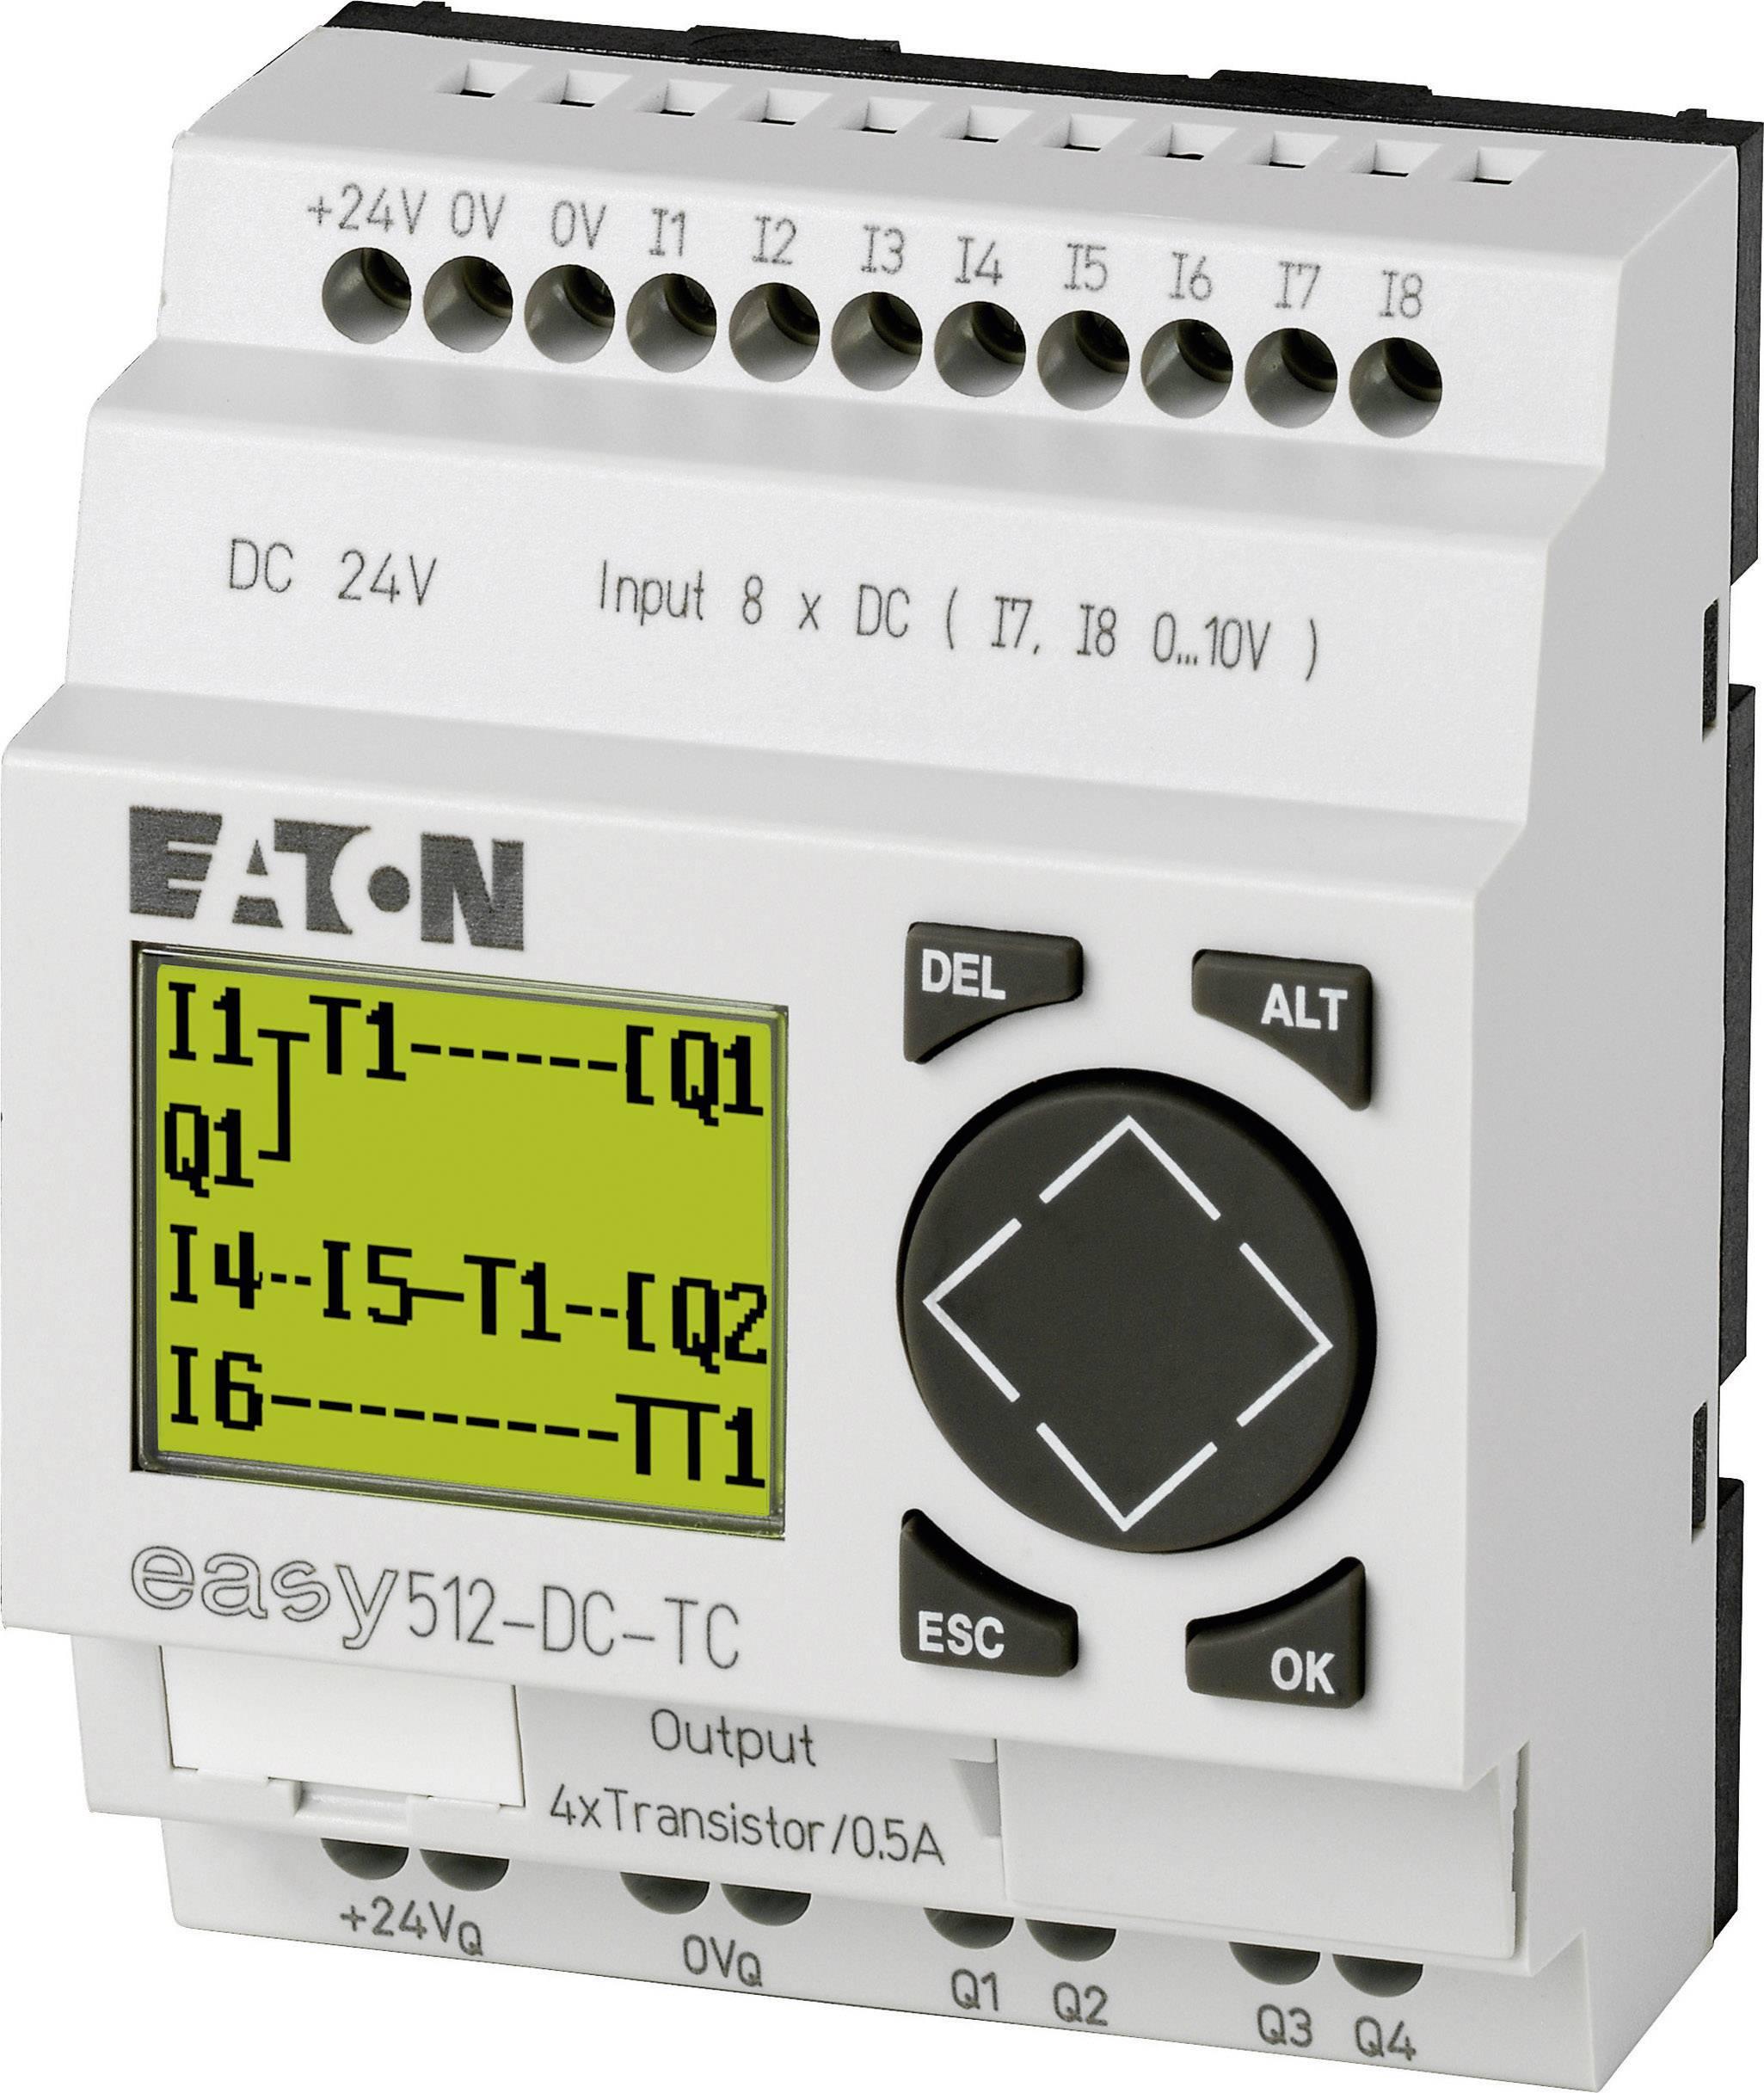 Riadiacimodul Eaton easy 512-DC-TC 274111, 24 V/DC